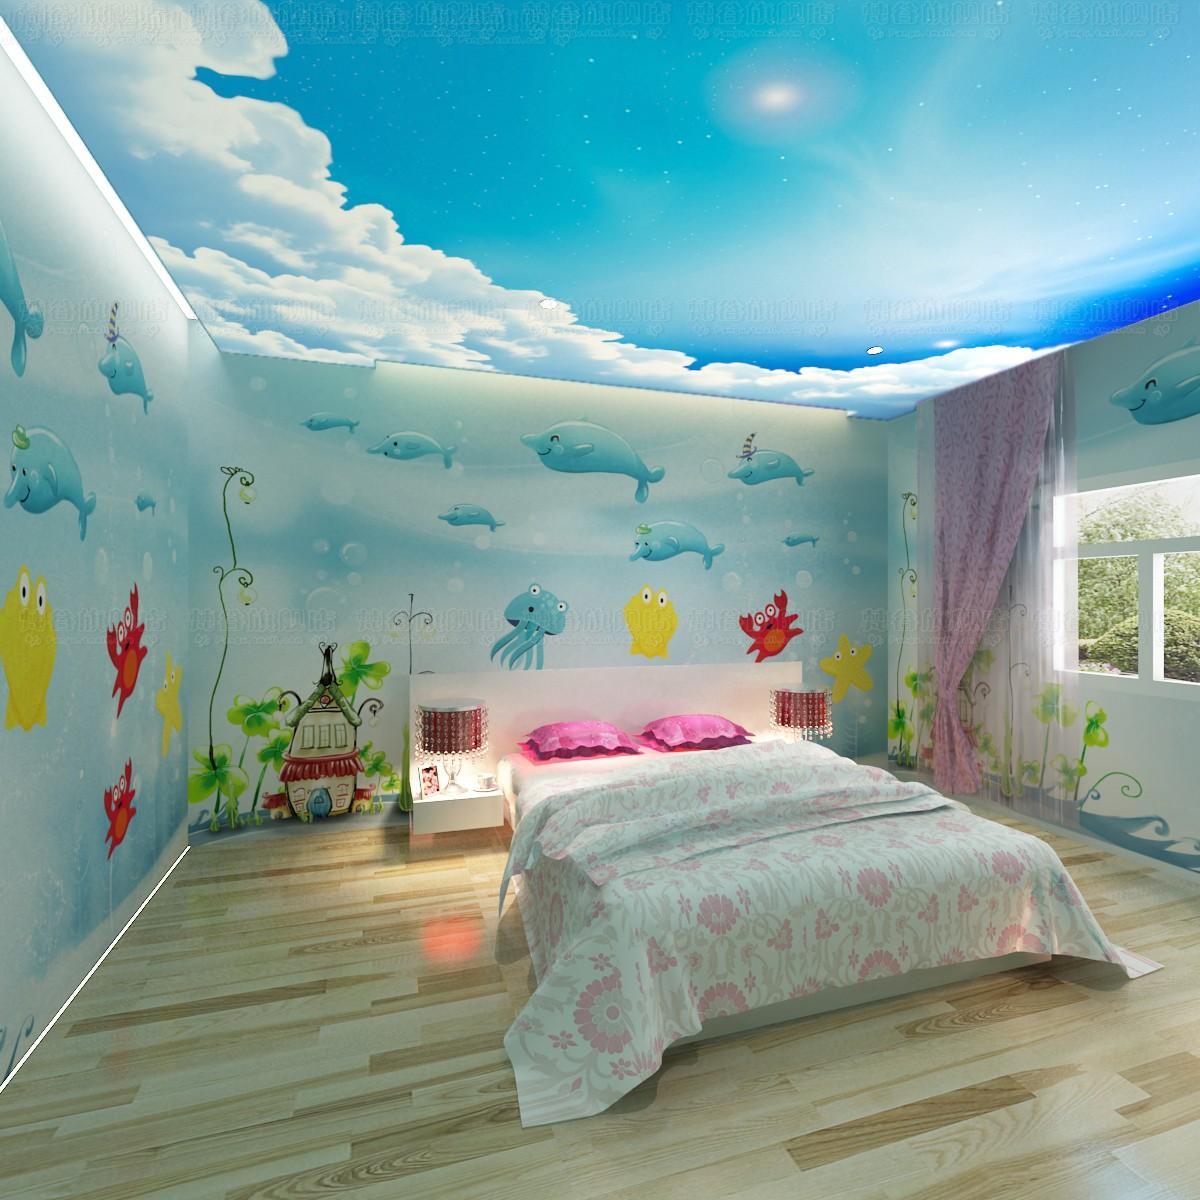 Castle Wall Wallpaper Kid Room 3d Hd Online Toptan Alım Yapın Yunus Duvar Kağıdı 199 In Den Yunus